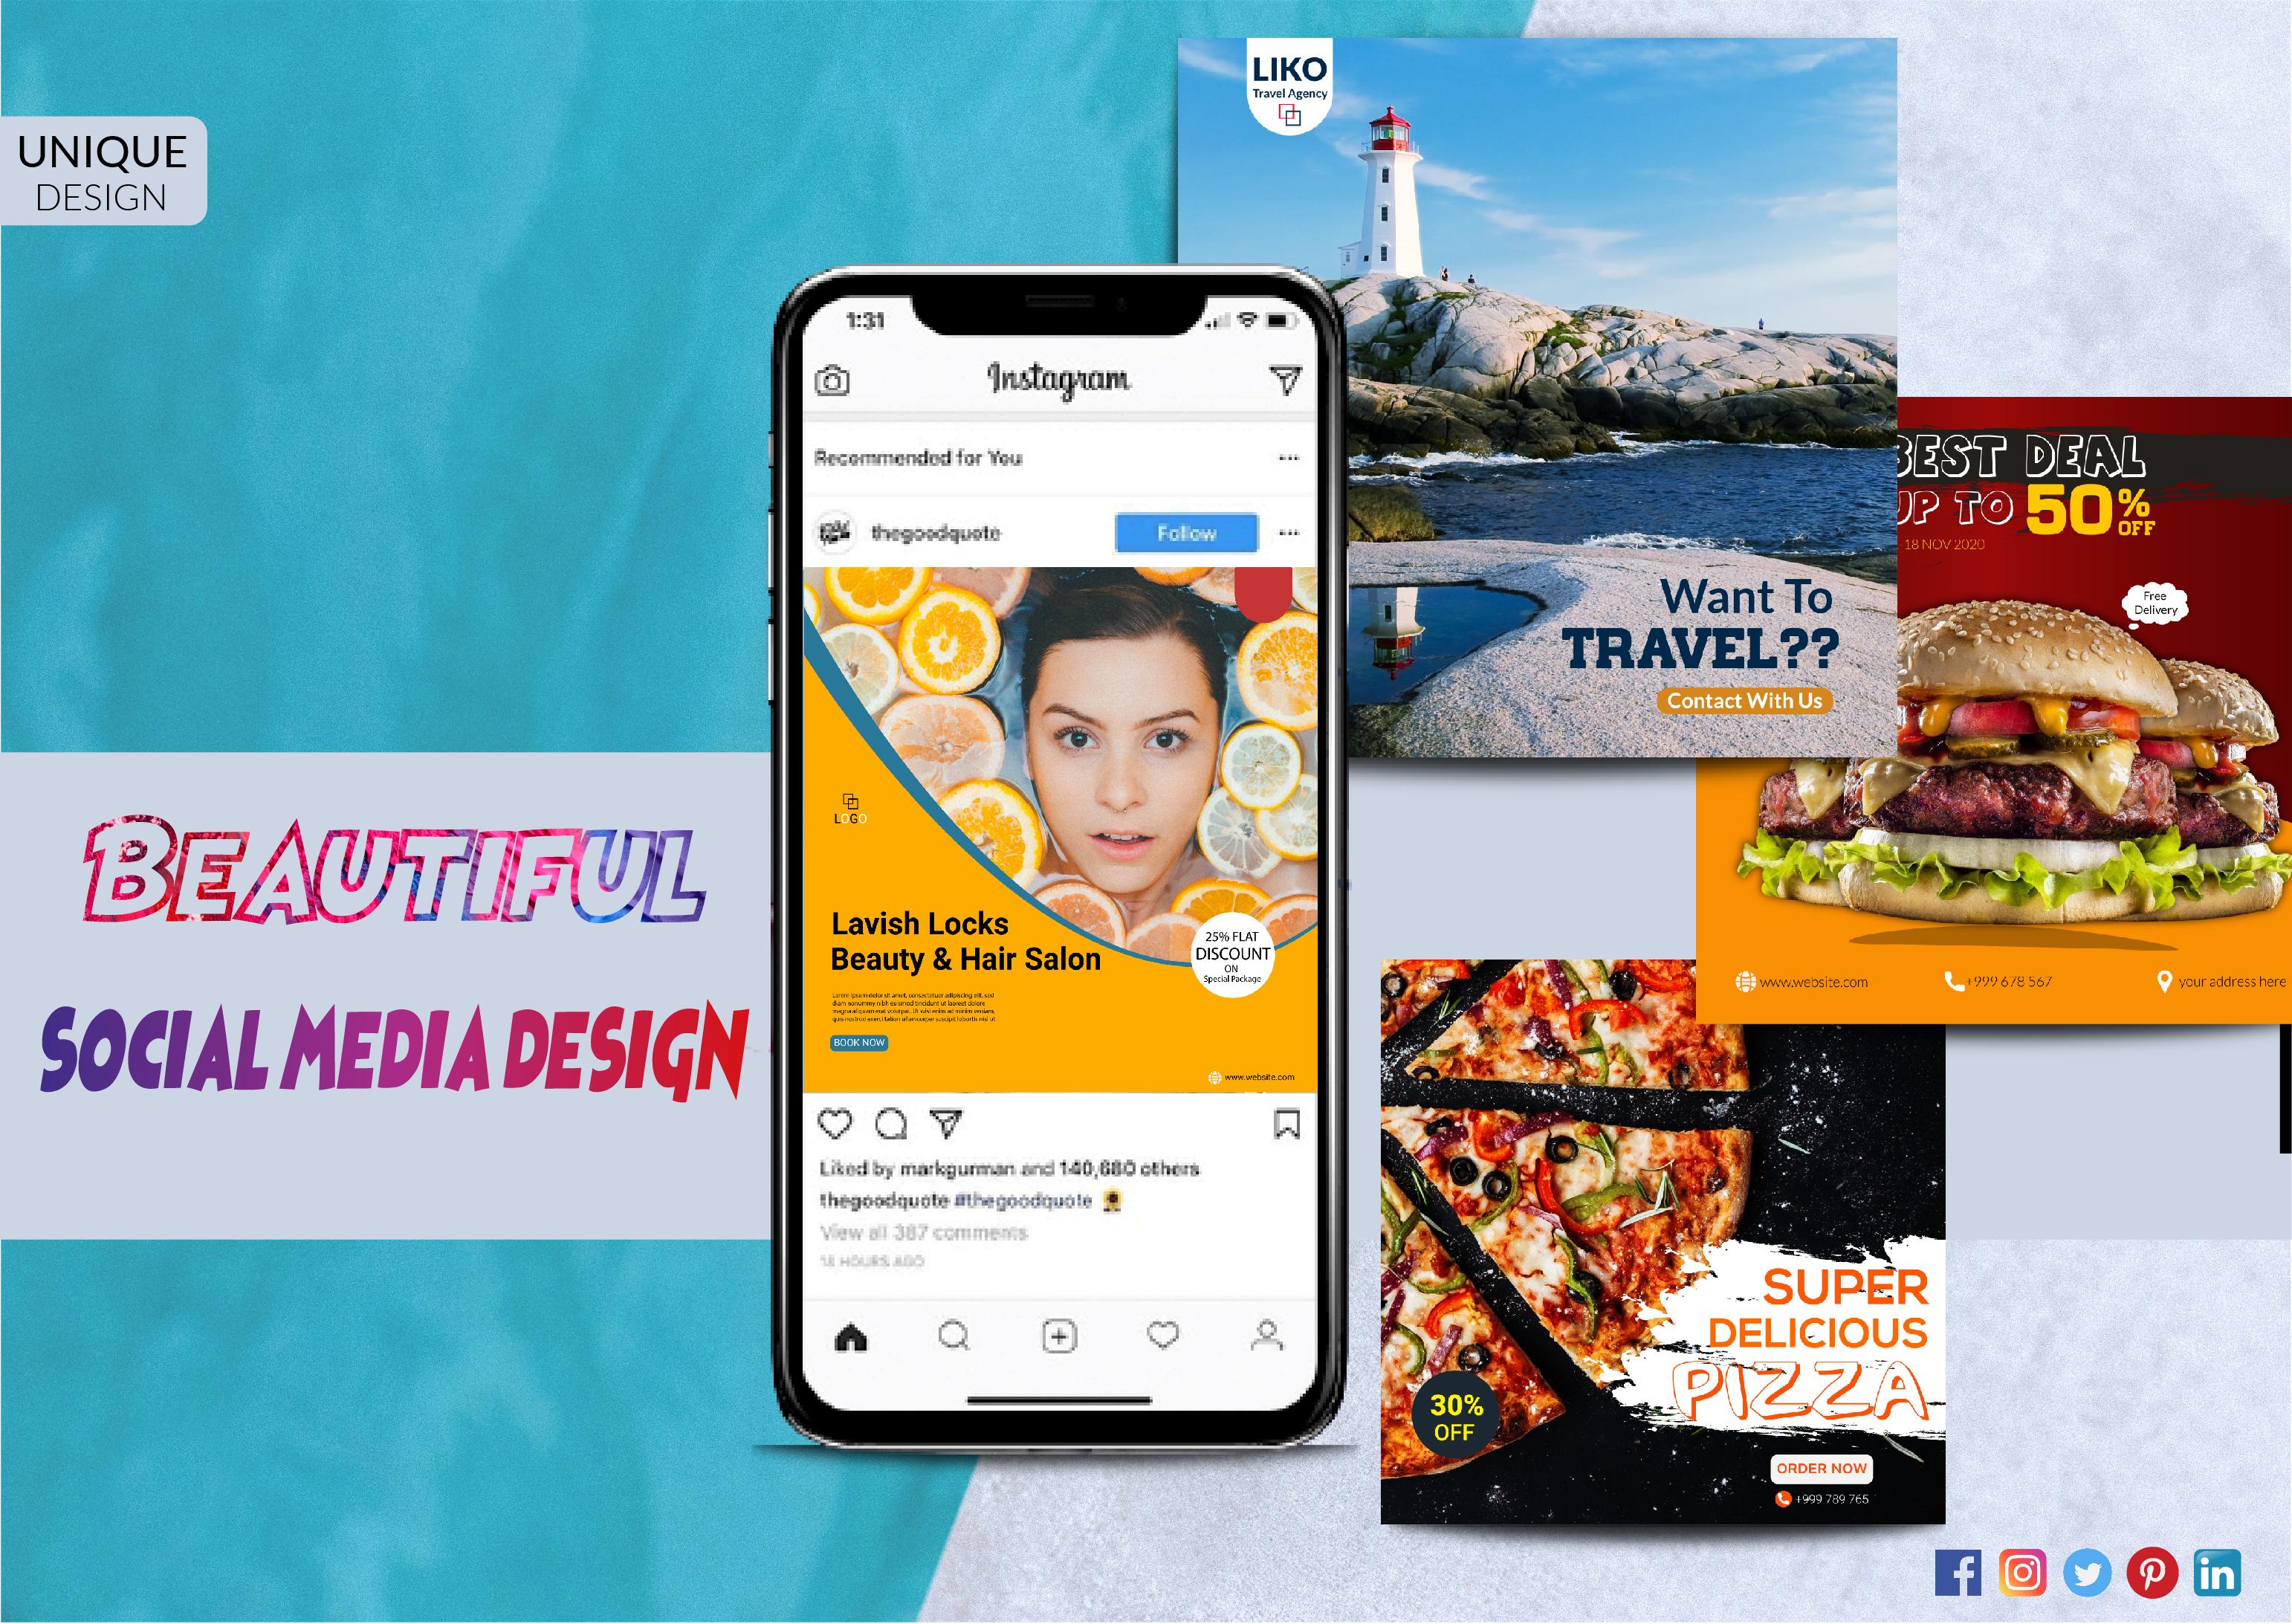 I will create you a beautiful Instagram / Facebook social media design